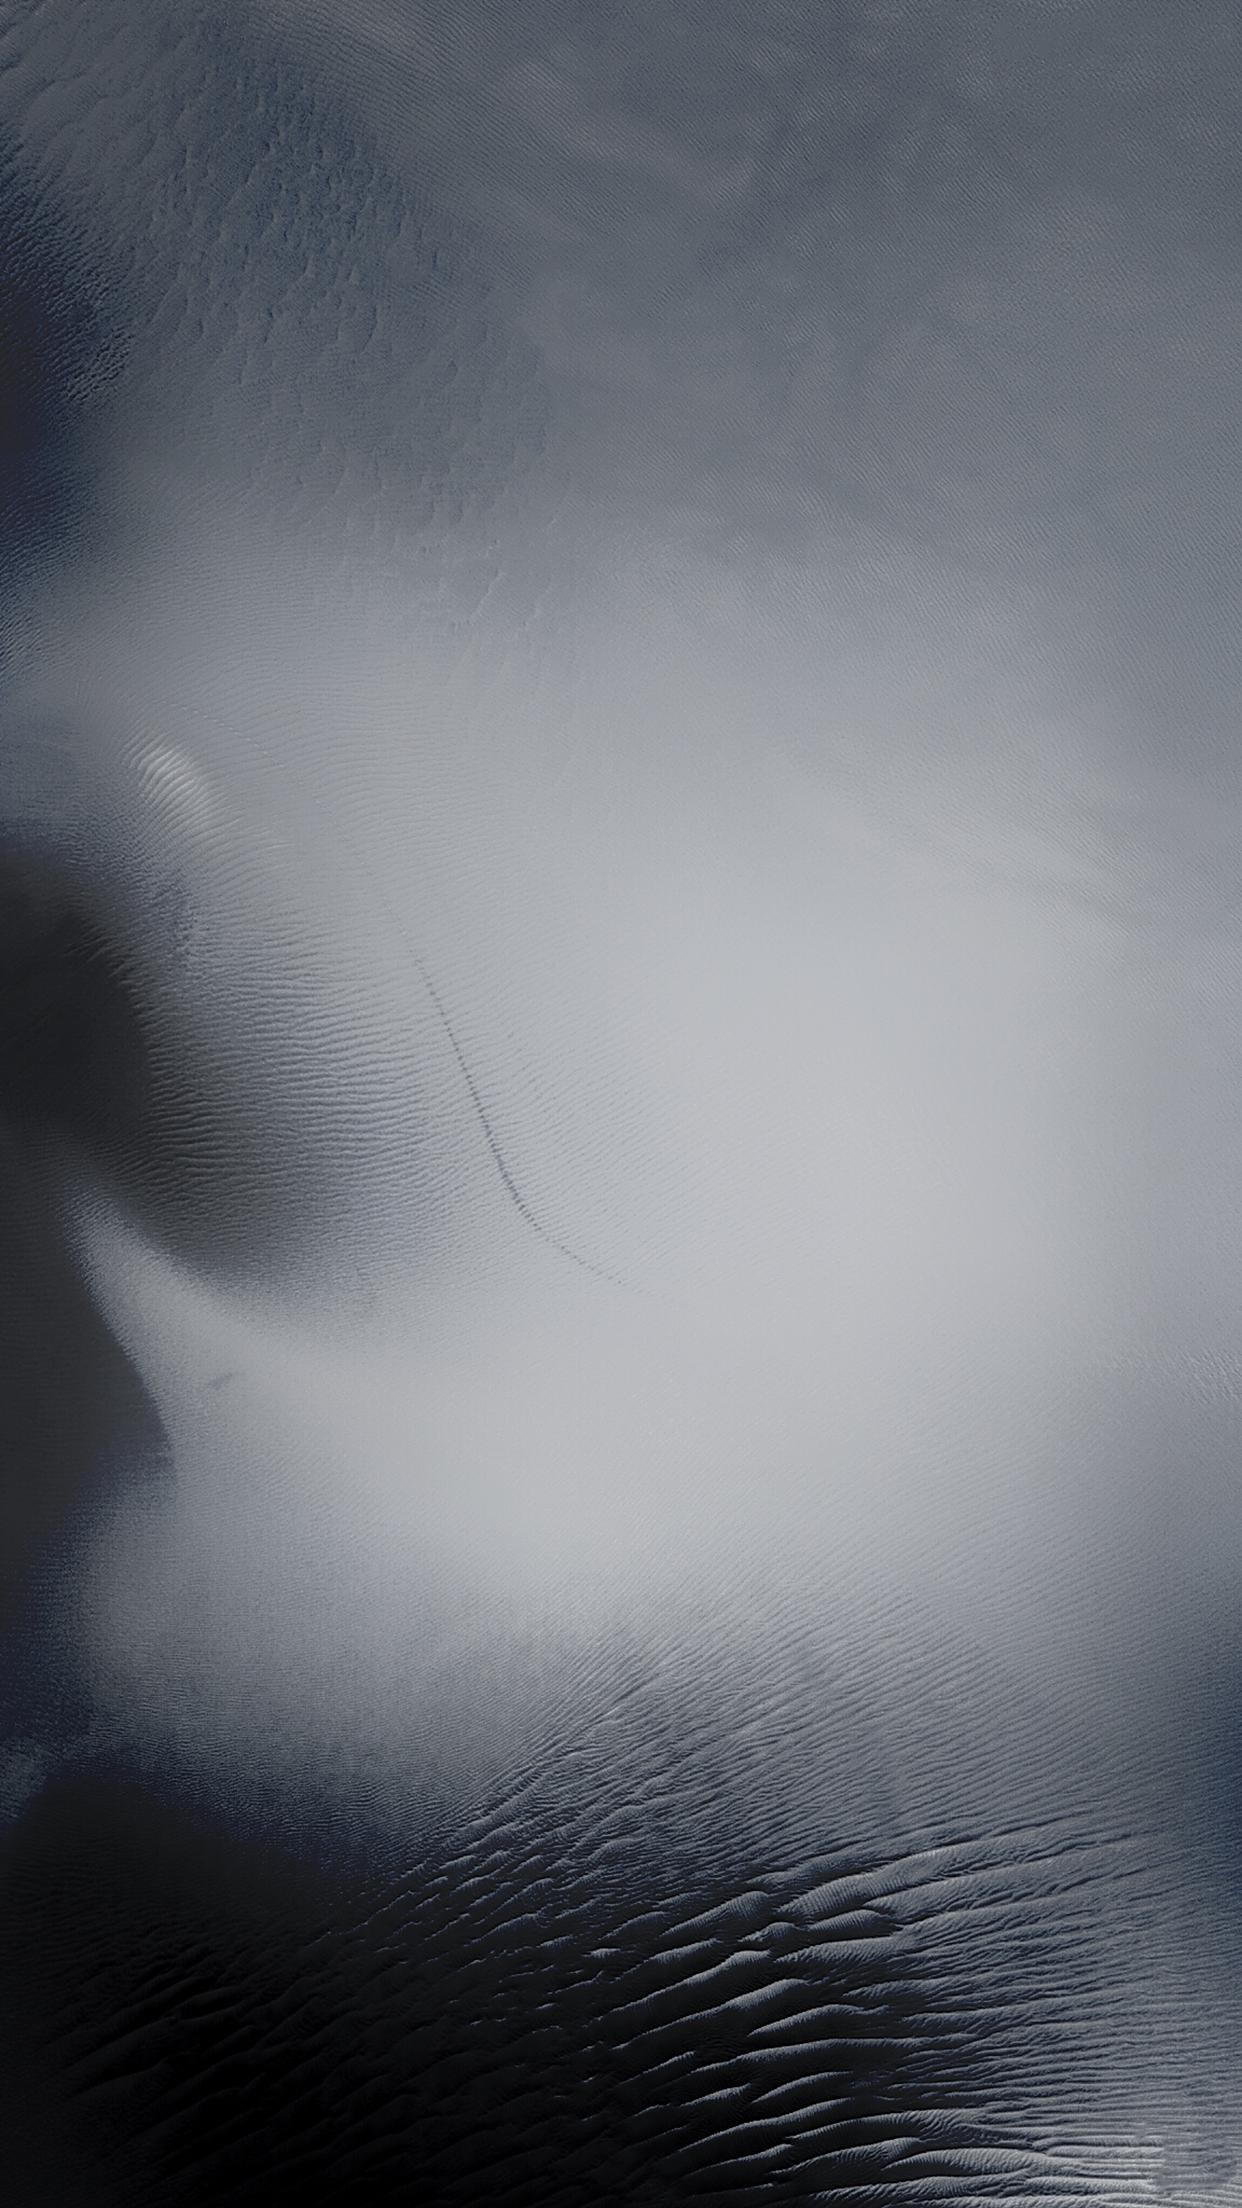 Iphone 11 Wallpaper Dark - HD Wallpaper